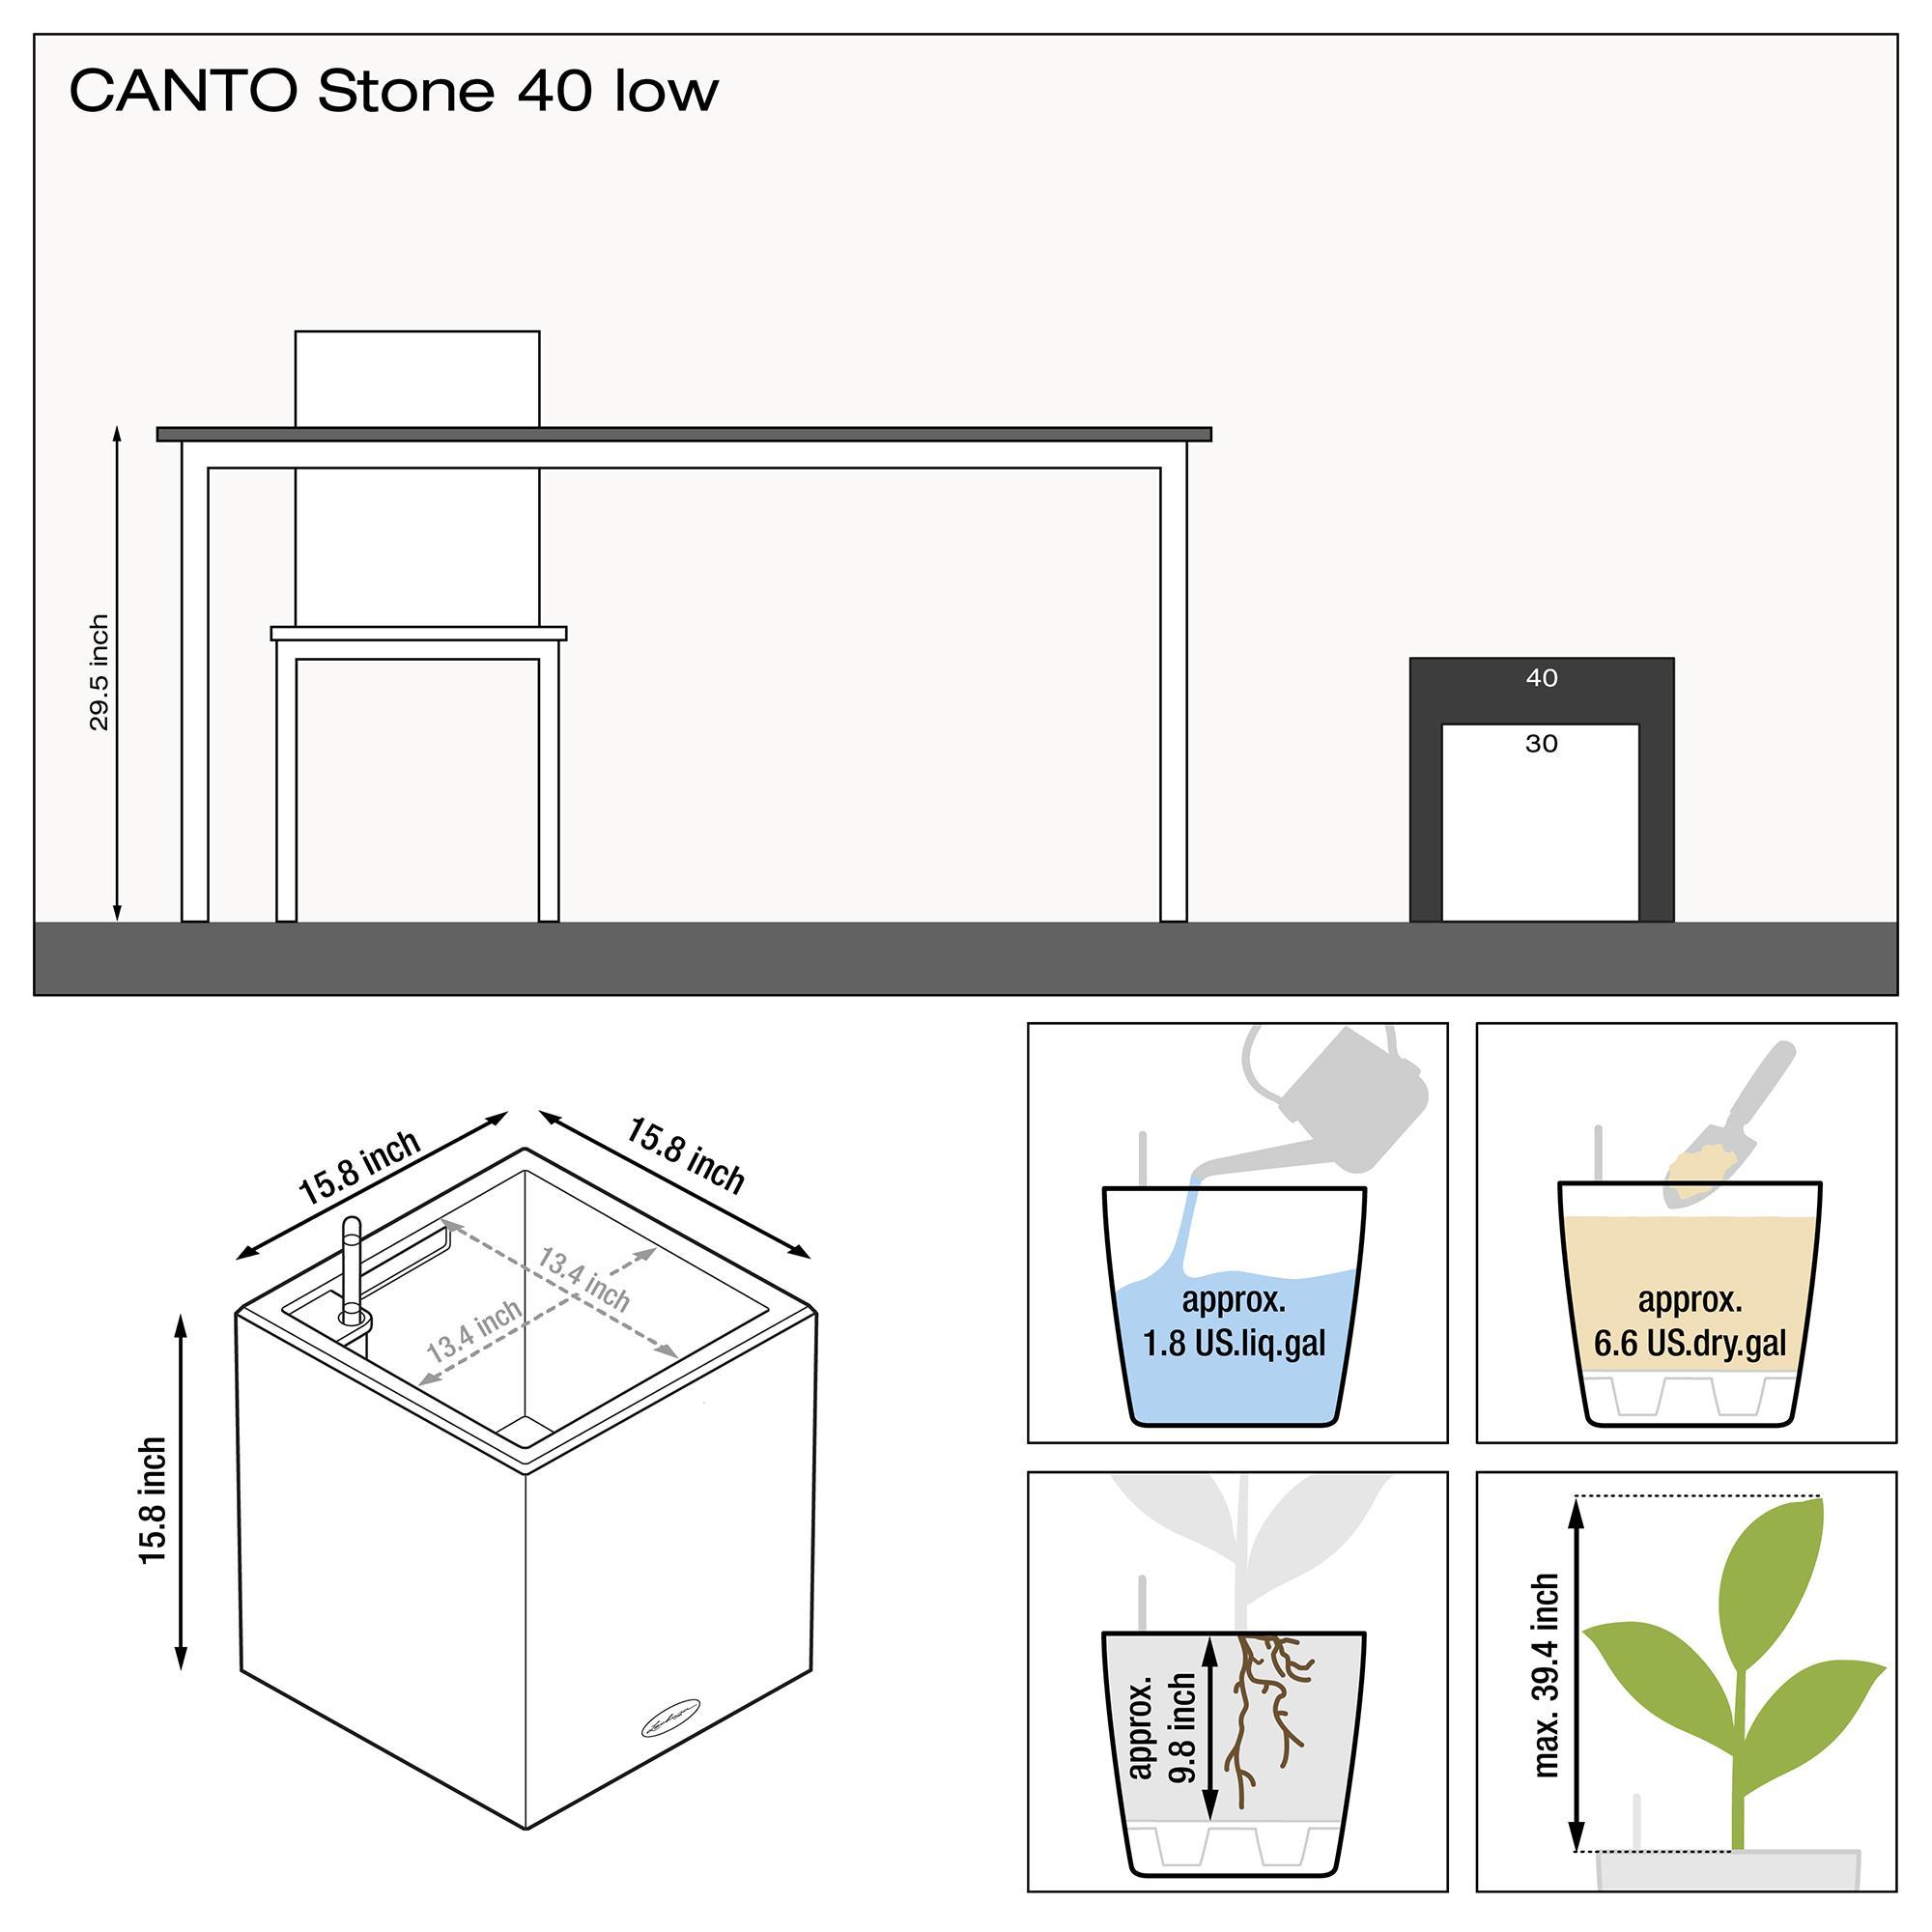 le_canto-stone-wuerfel40_product_addi_nz_us